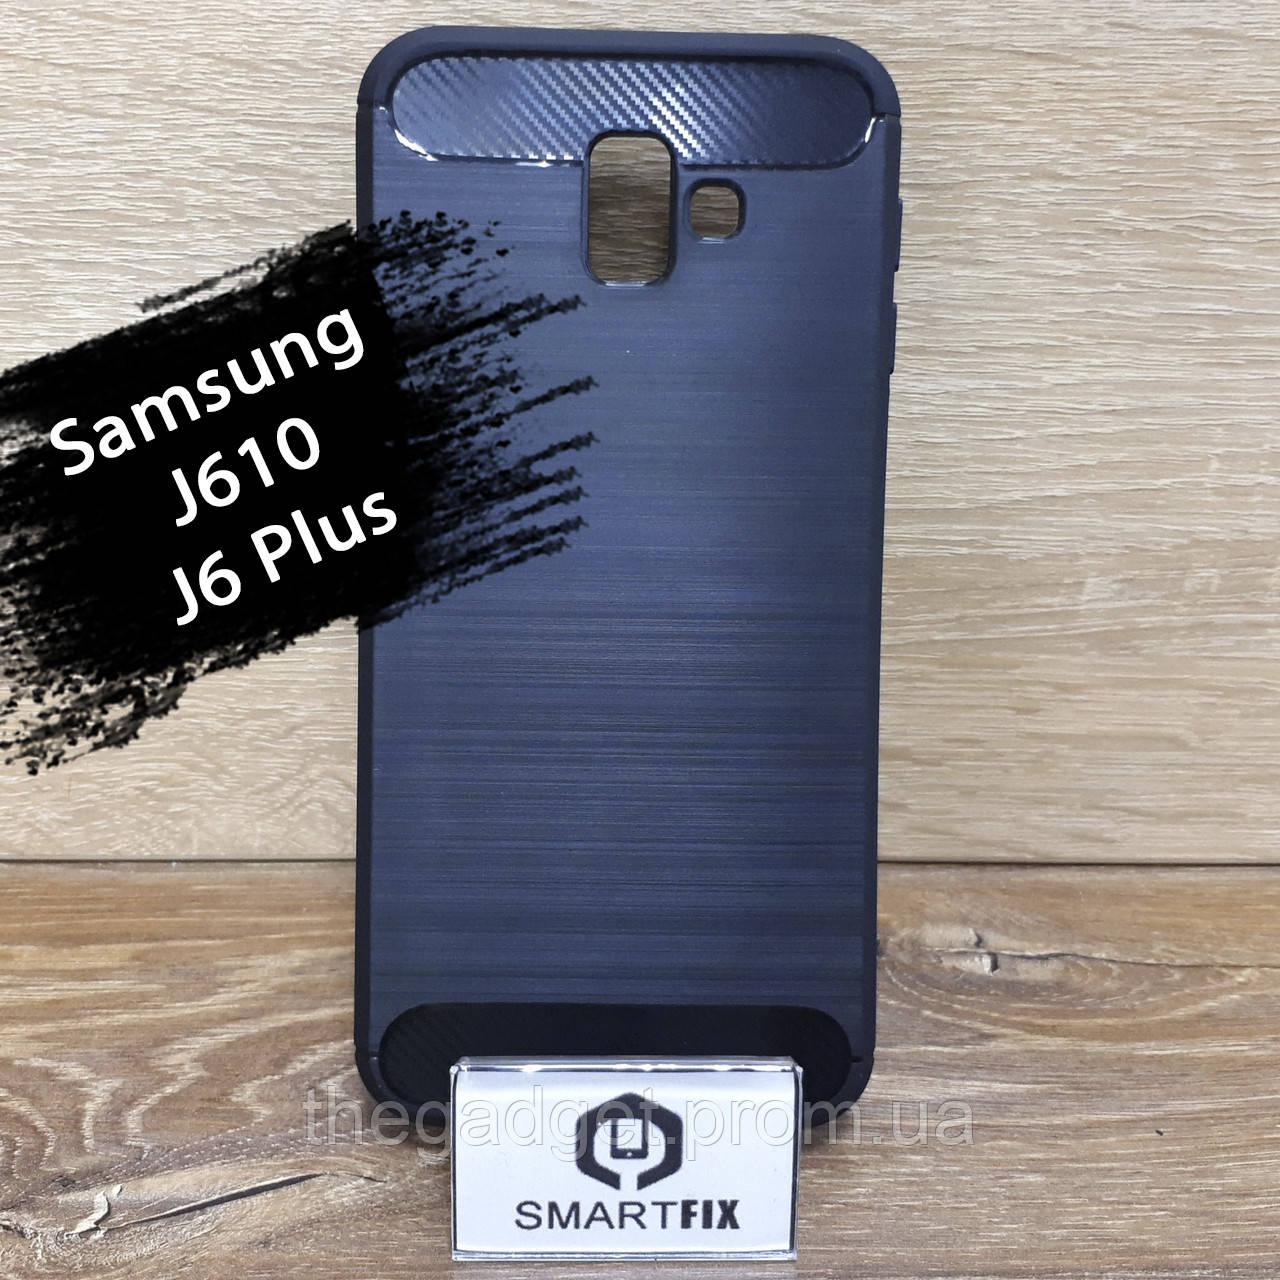 Протиударний чохол для Samsung J6 Plus / J610 Ultimate